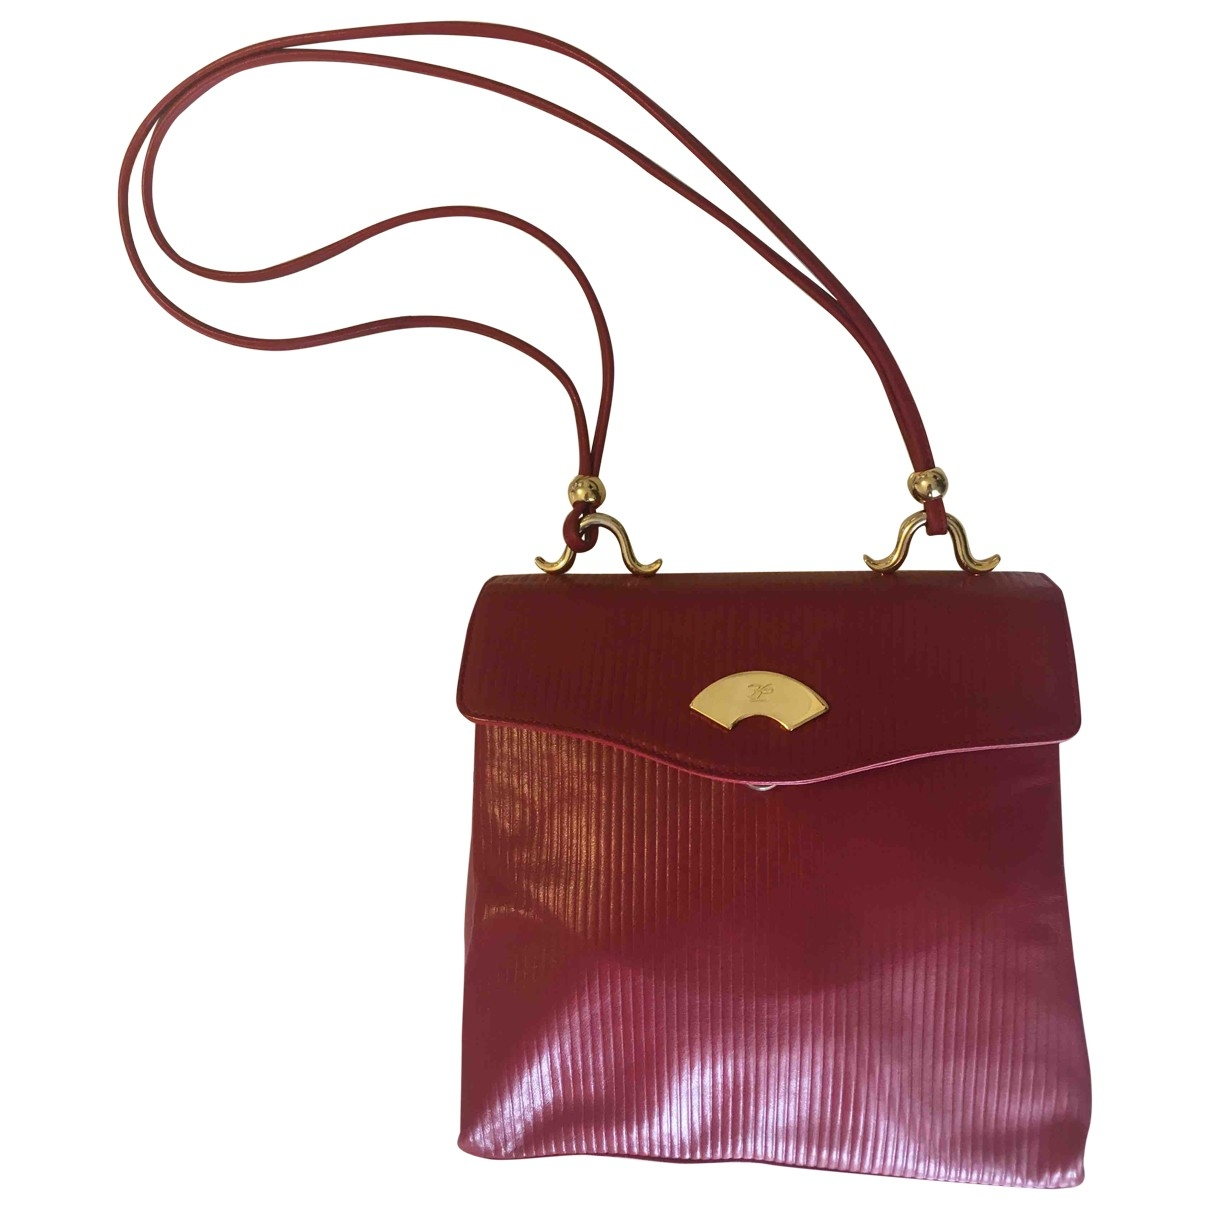 Karl Lagerfeld \N Red Leather handbag for Women \N